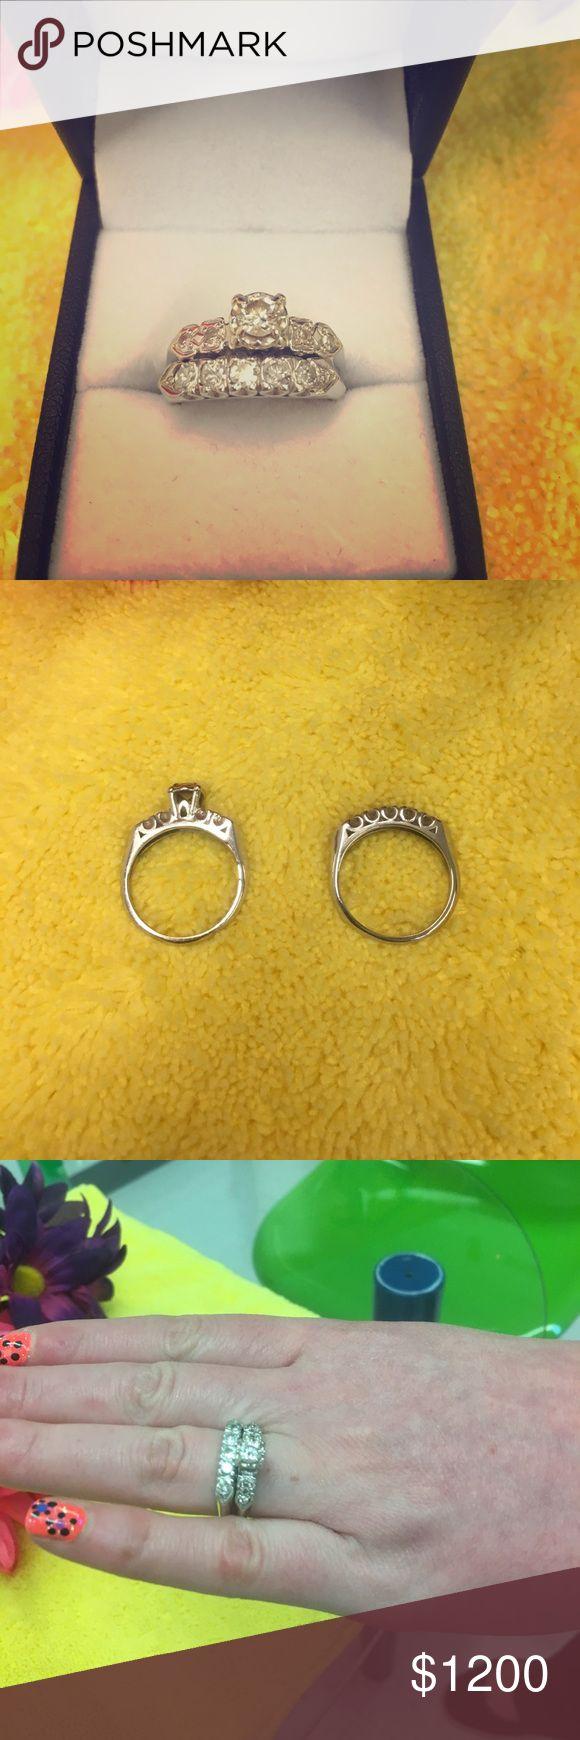 Beautiful engagement ring set Size 7 engagement ring set white gold it's a 3/4 karat diamond ring set Jewelry Rings